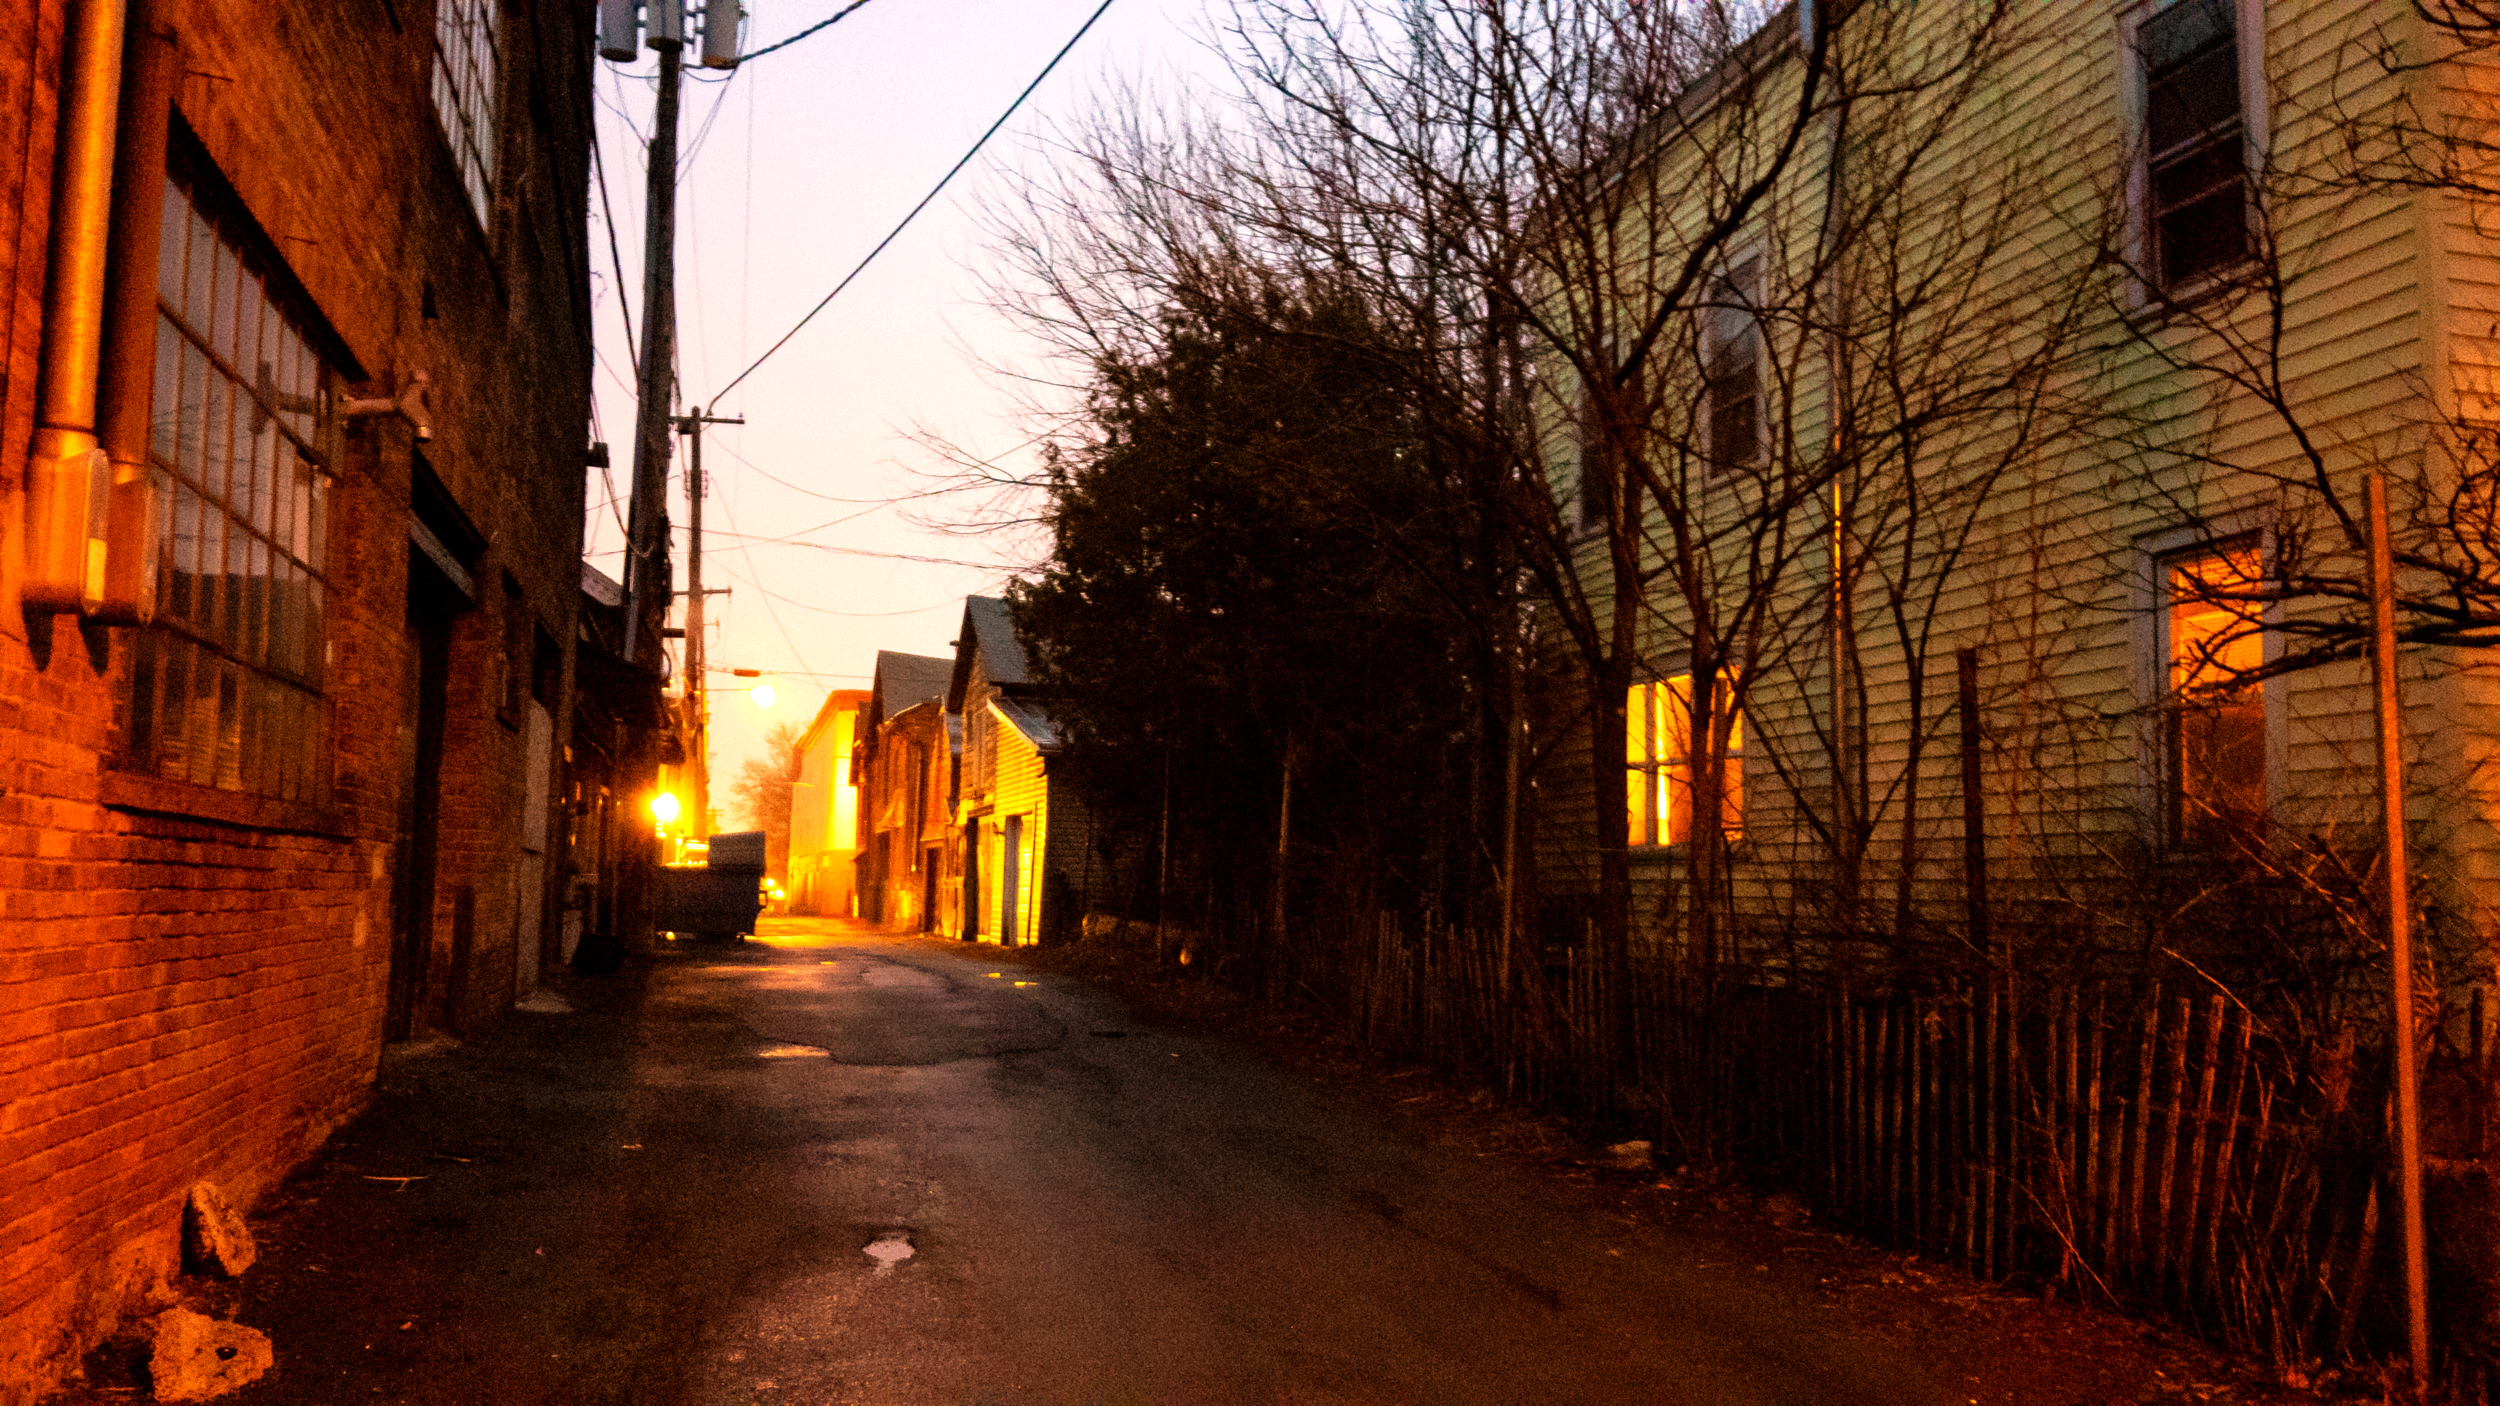 Prison Alley & 8th Street, Hudson NY